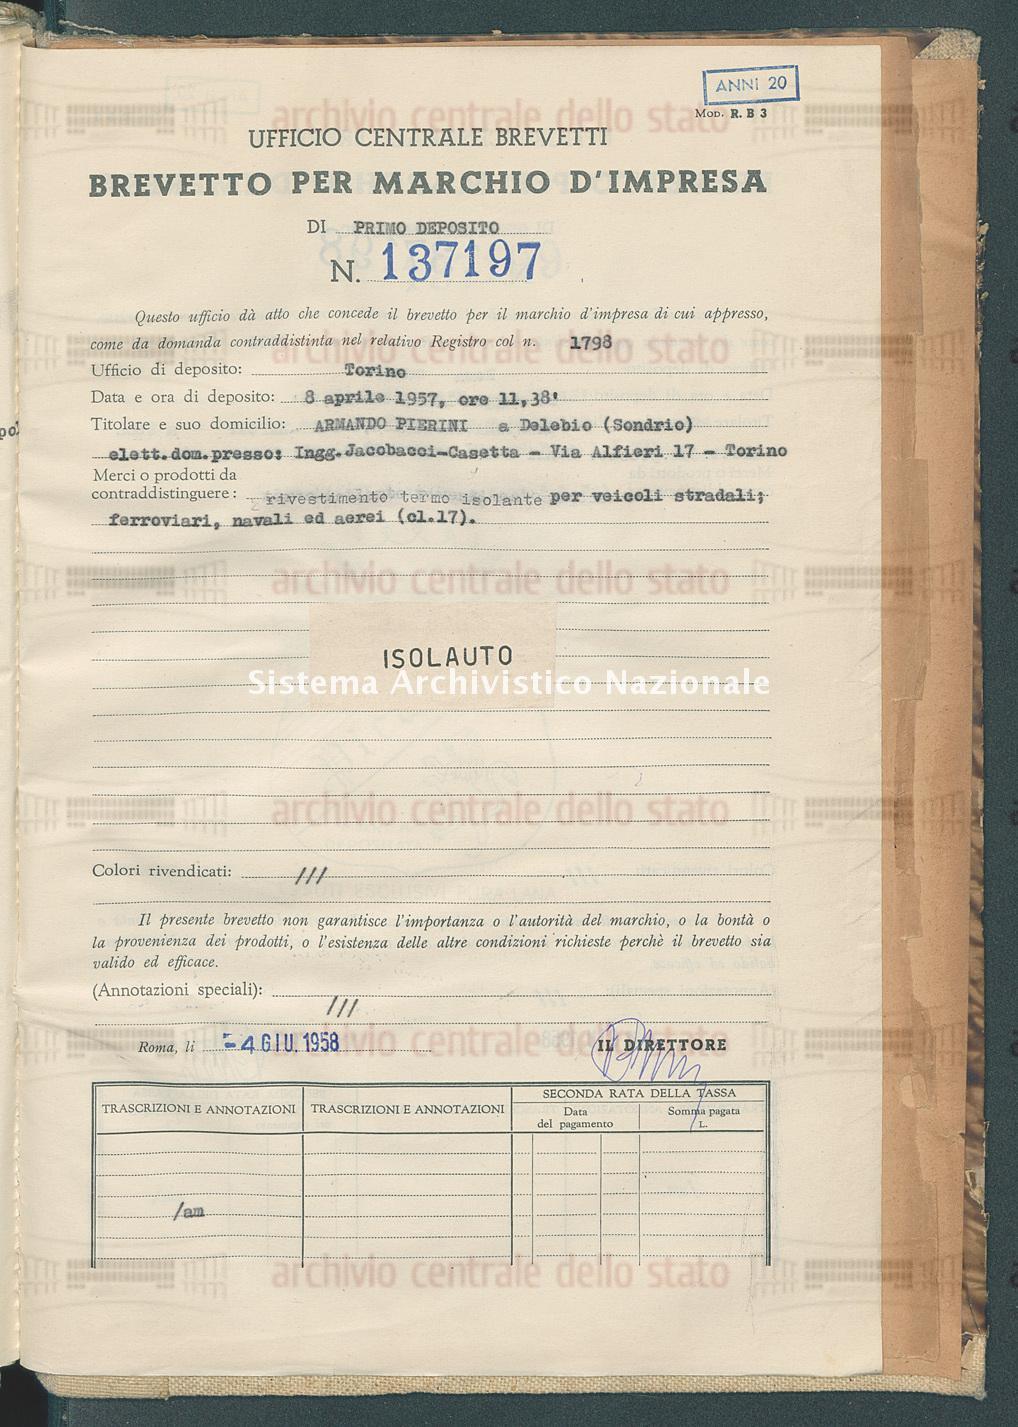 Rivestimento termo isolante ecc. Armando Pierini (04/06/1958)